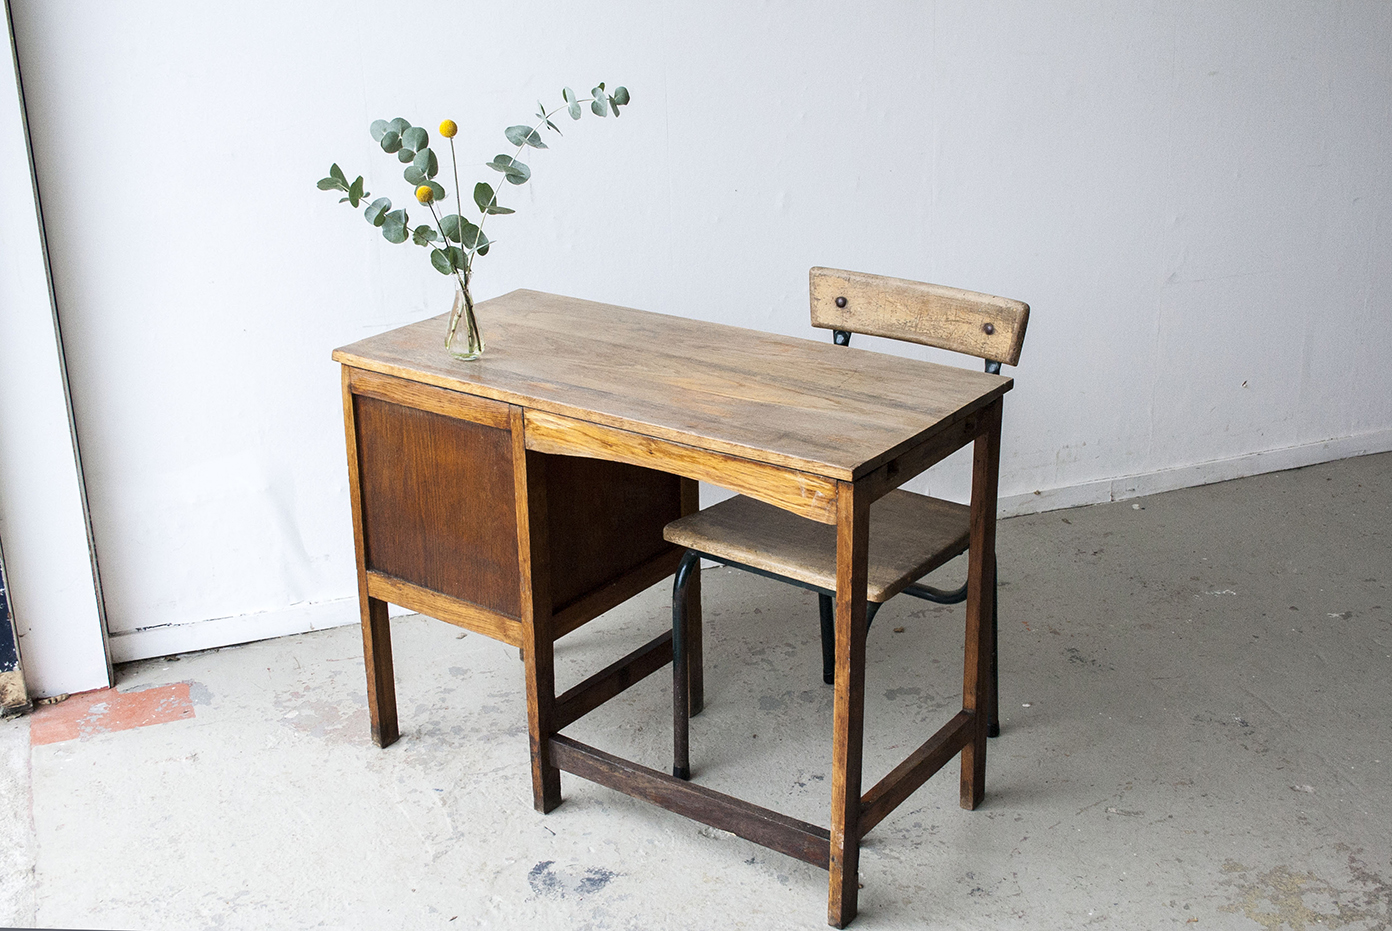 Leuk Houten Bureautje.3123 Houten Vintage Bureautje Firma Zoethout